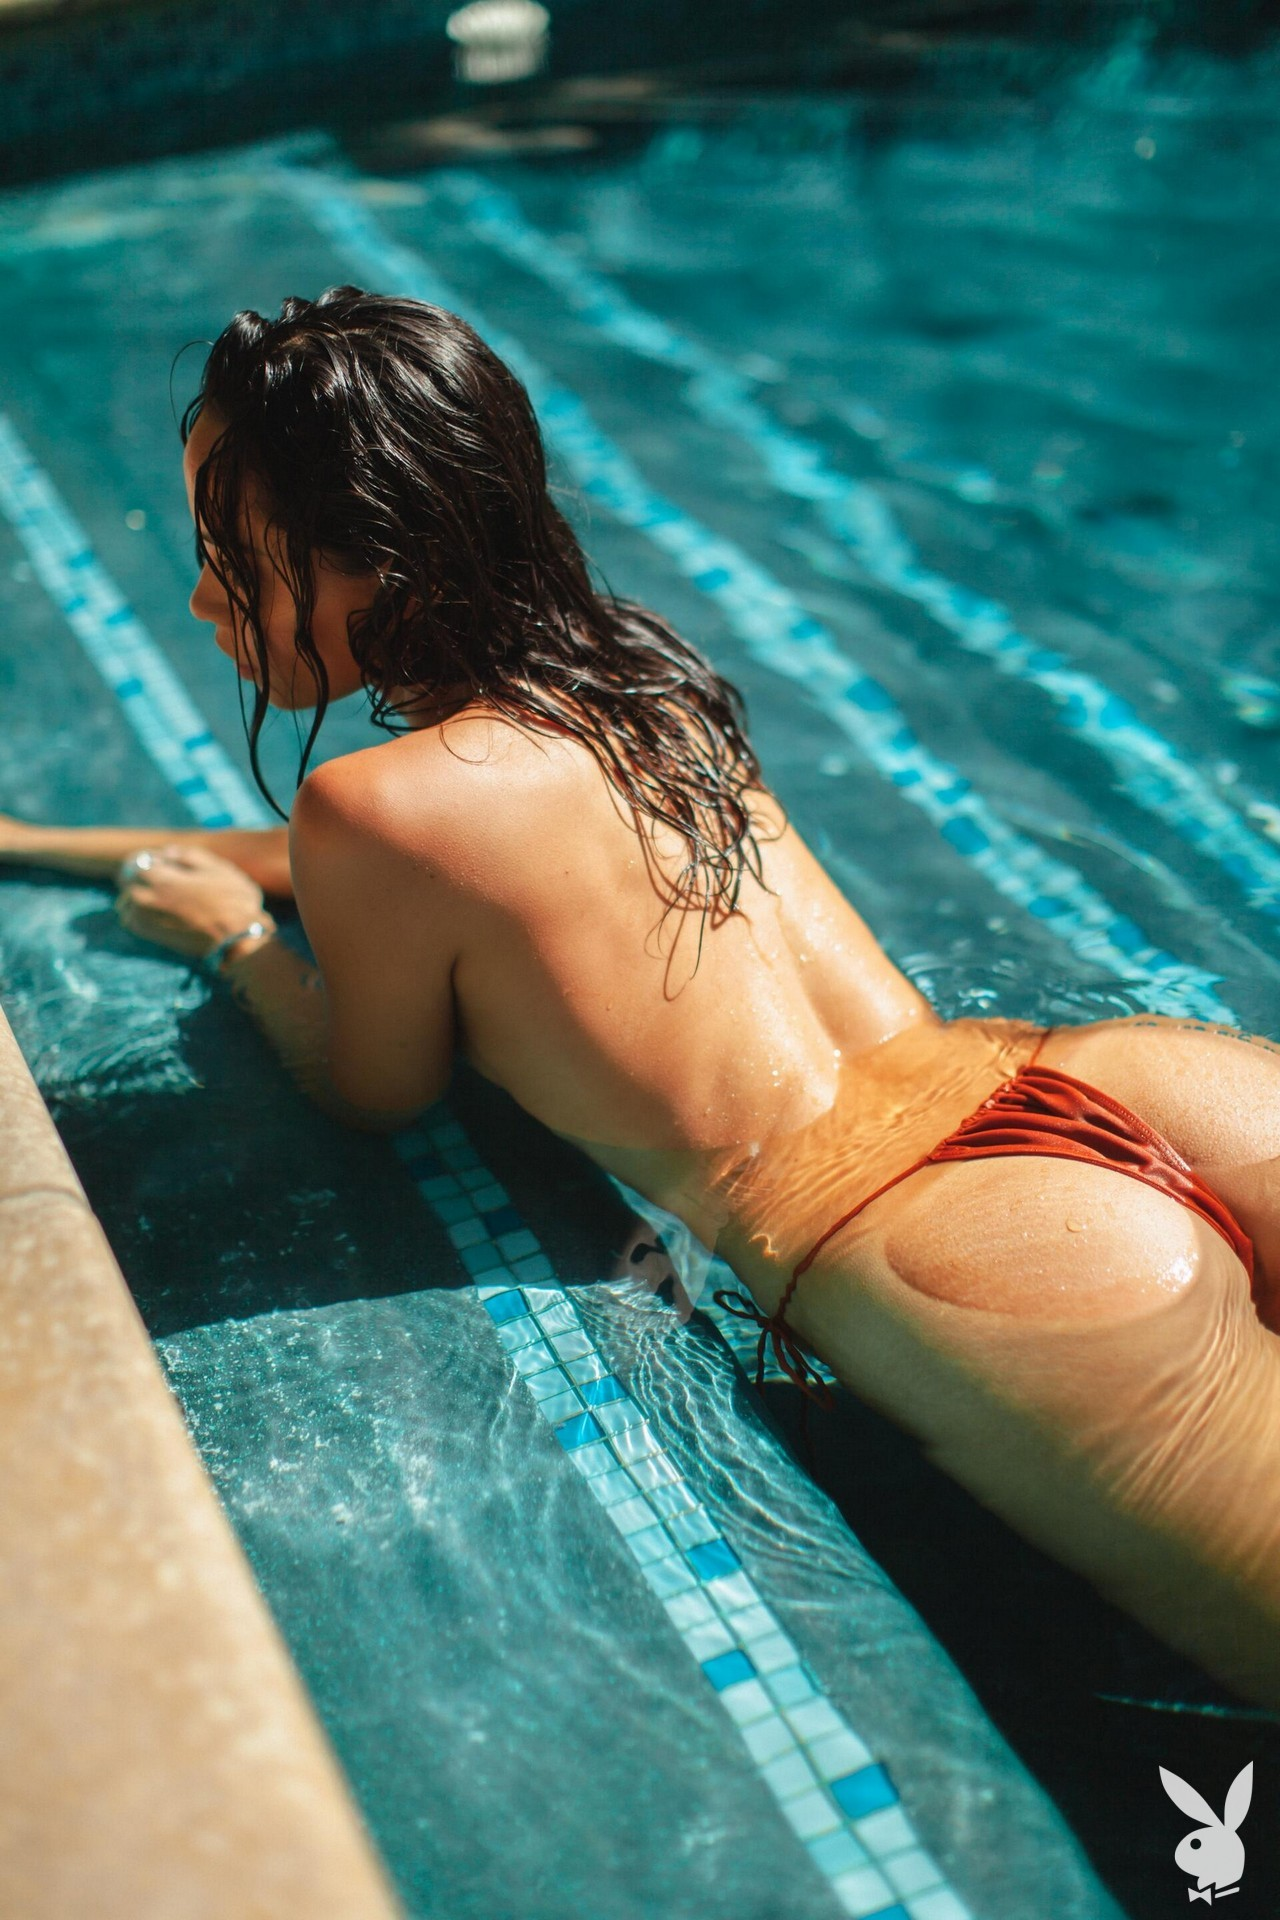 Playmate September 2020 Danielle Alcaraz Playboy Plus (39)